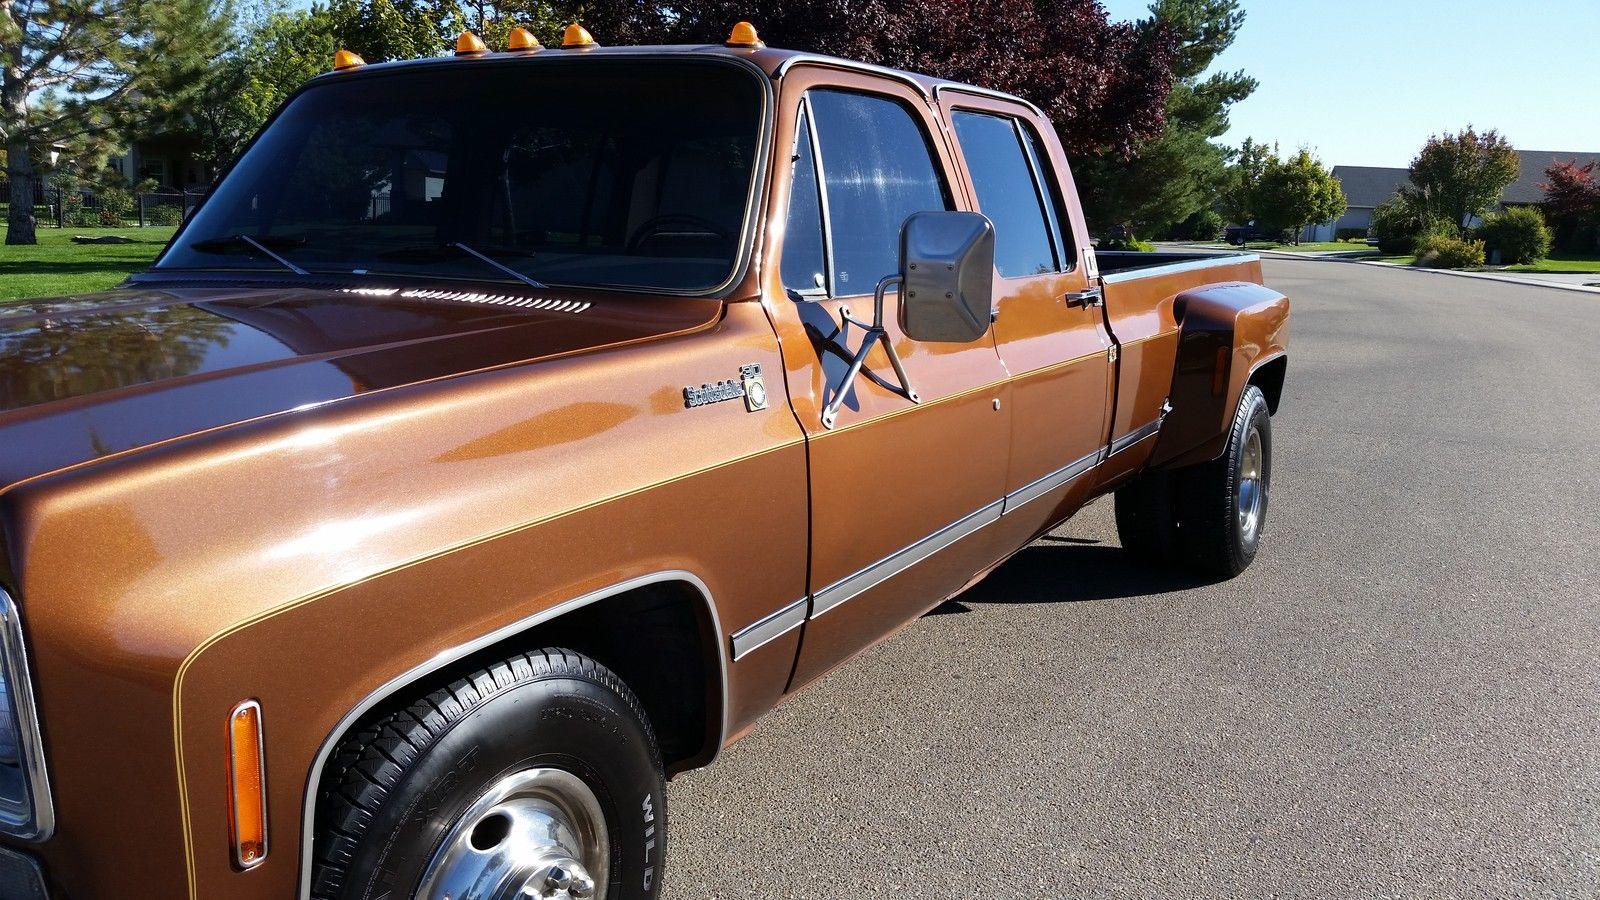 1976 1977 19781979 c k 2500 c3500 ck1500 crew cab chevy truck 3 3 4 door classic chevrolet c k. Black Bedroom Furniture Sets. Home Design Ideas